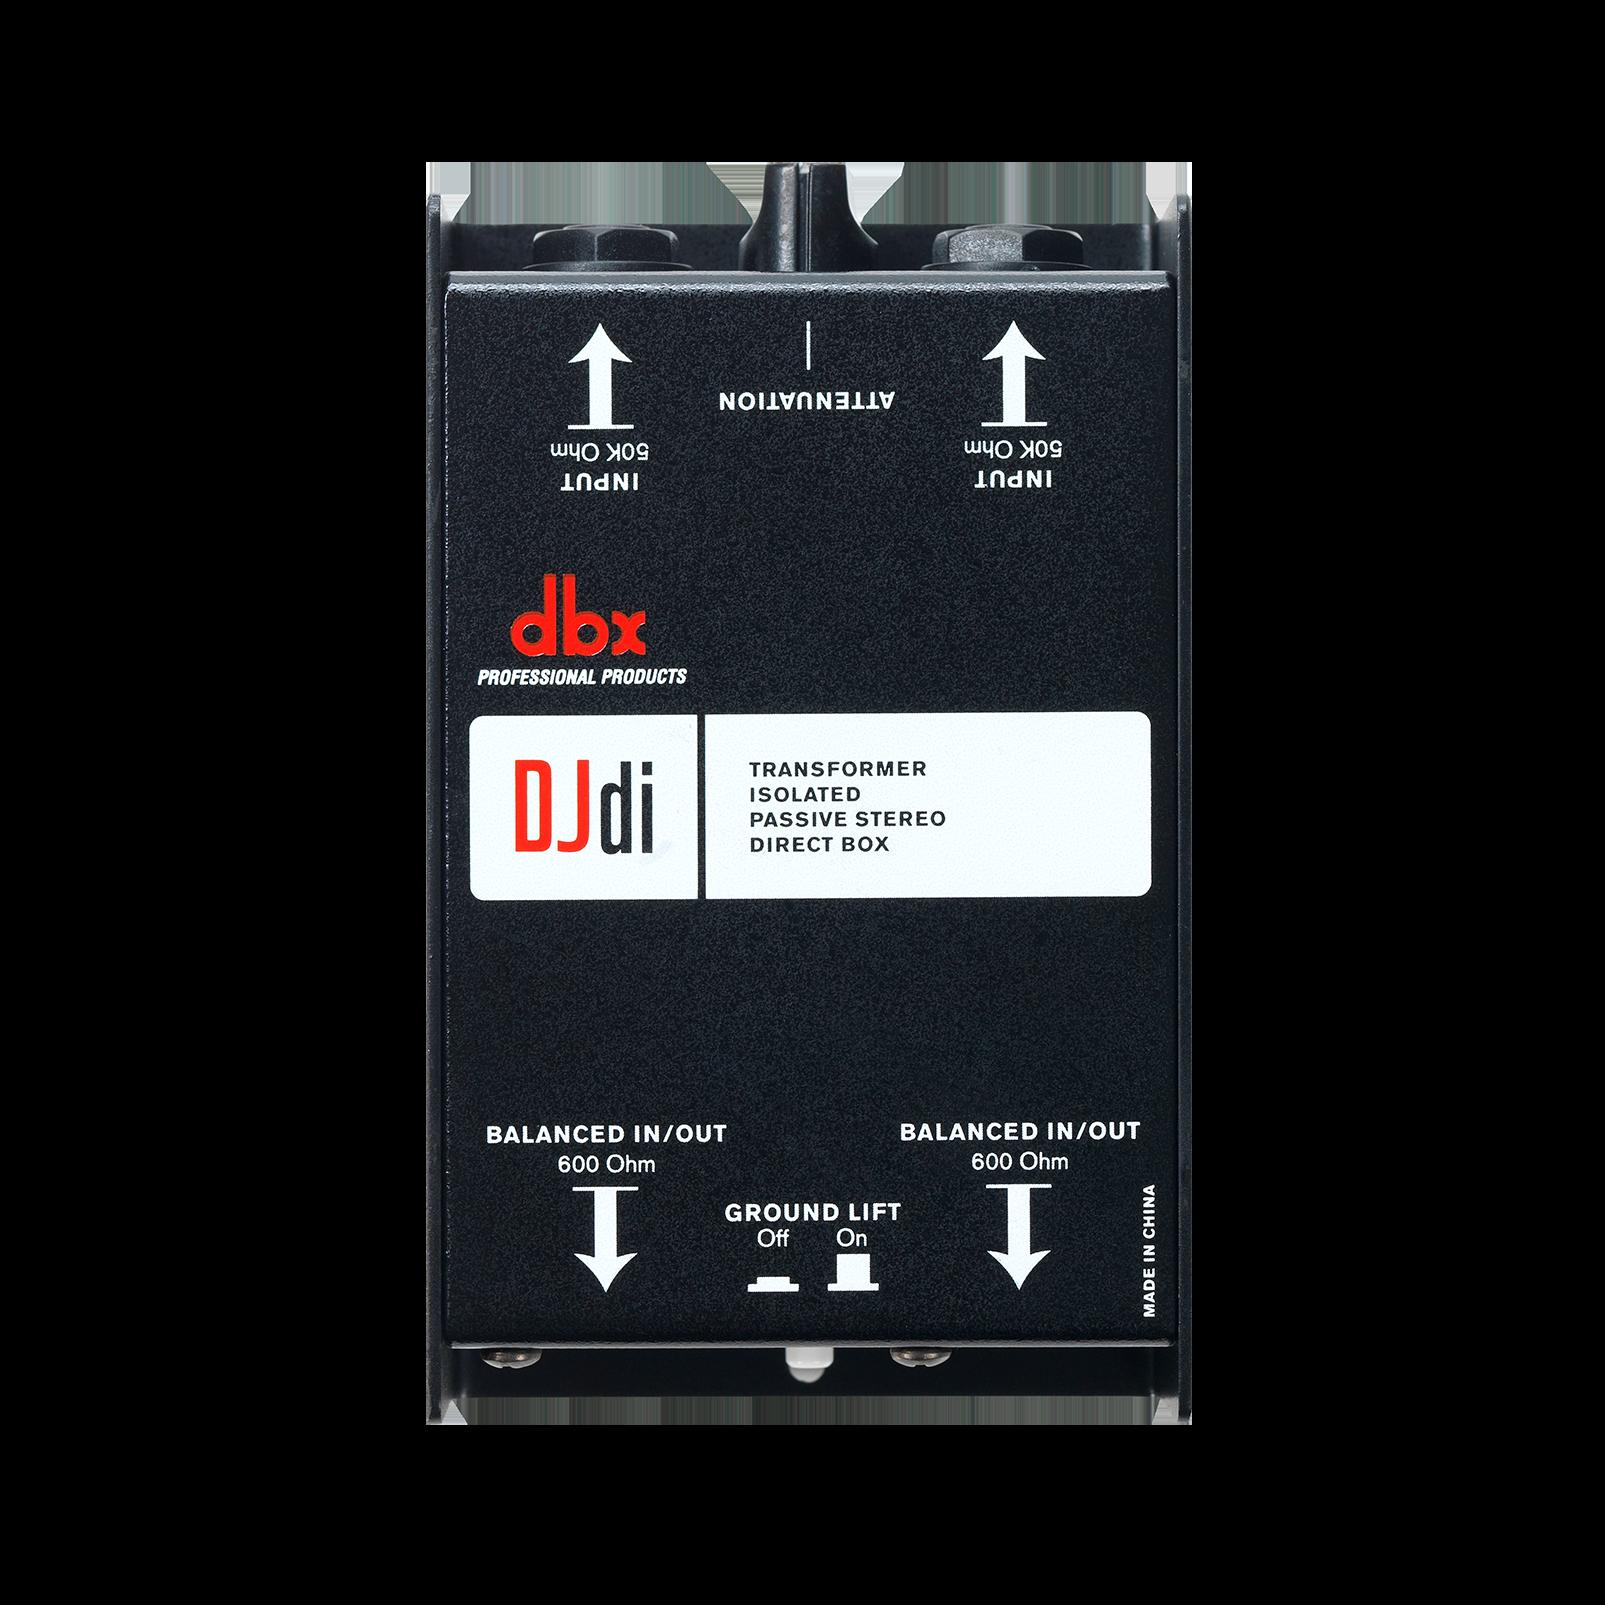 DJdi - Black - 2-channel Passive Direct Box - Detailshot 1